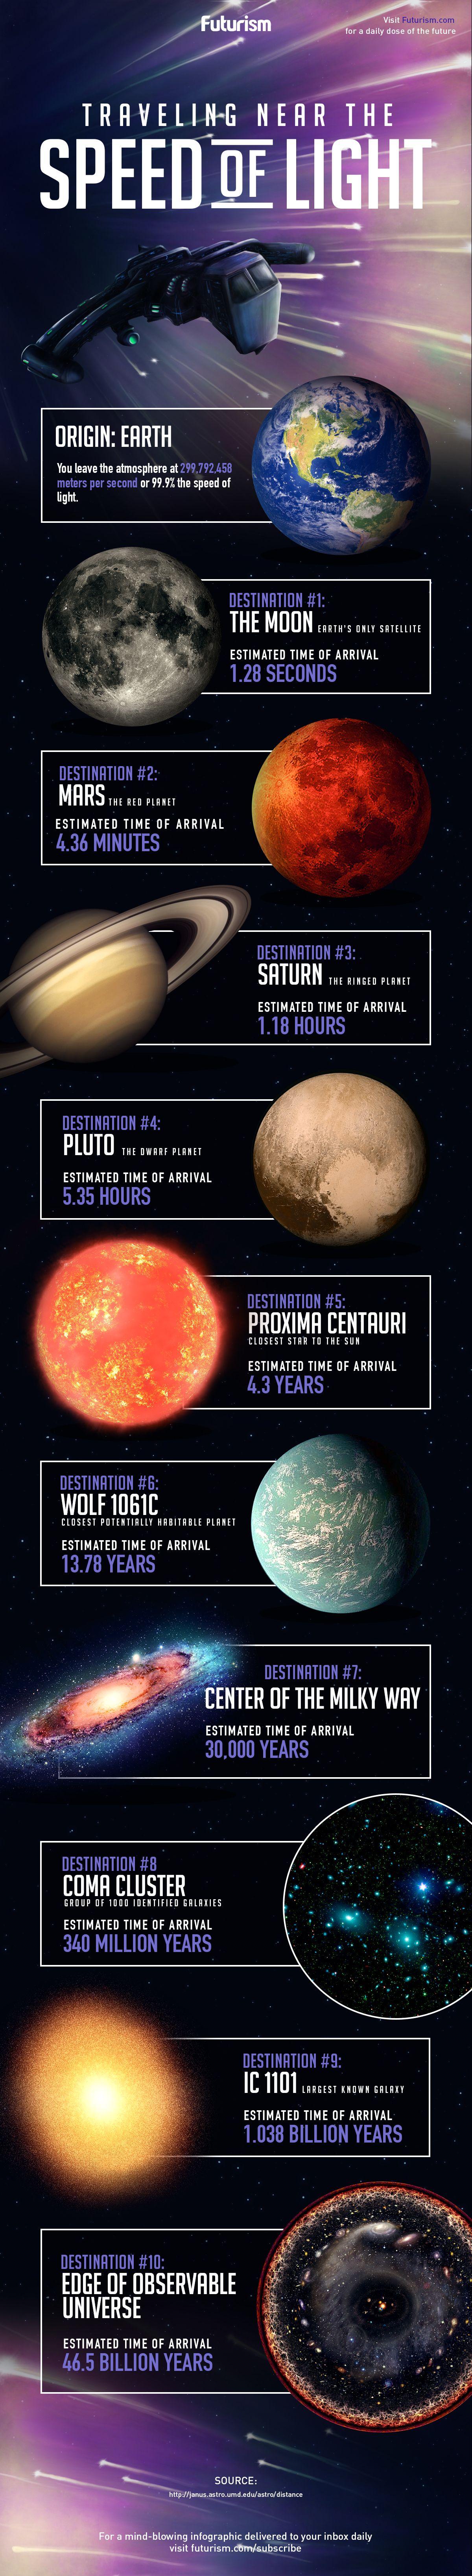 3dea64a3a3b29ff3462144002fc574b0 - How Long Does It Take To Get Around The Earth